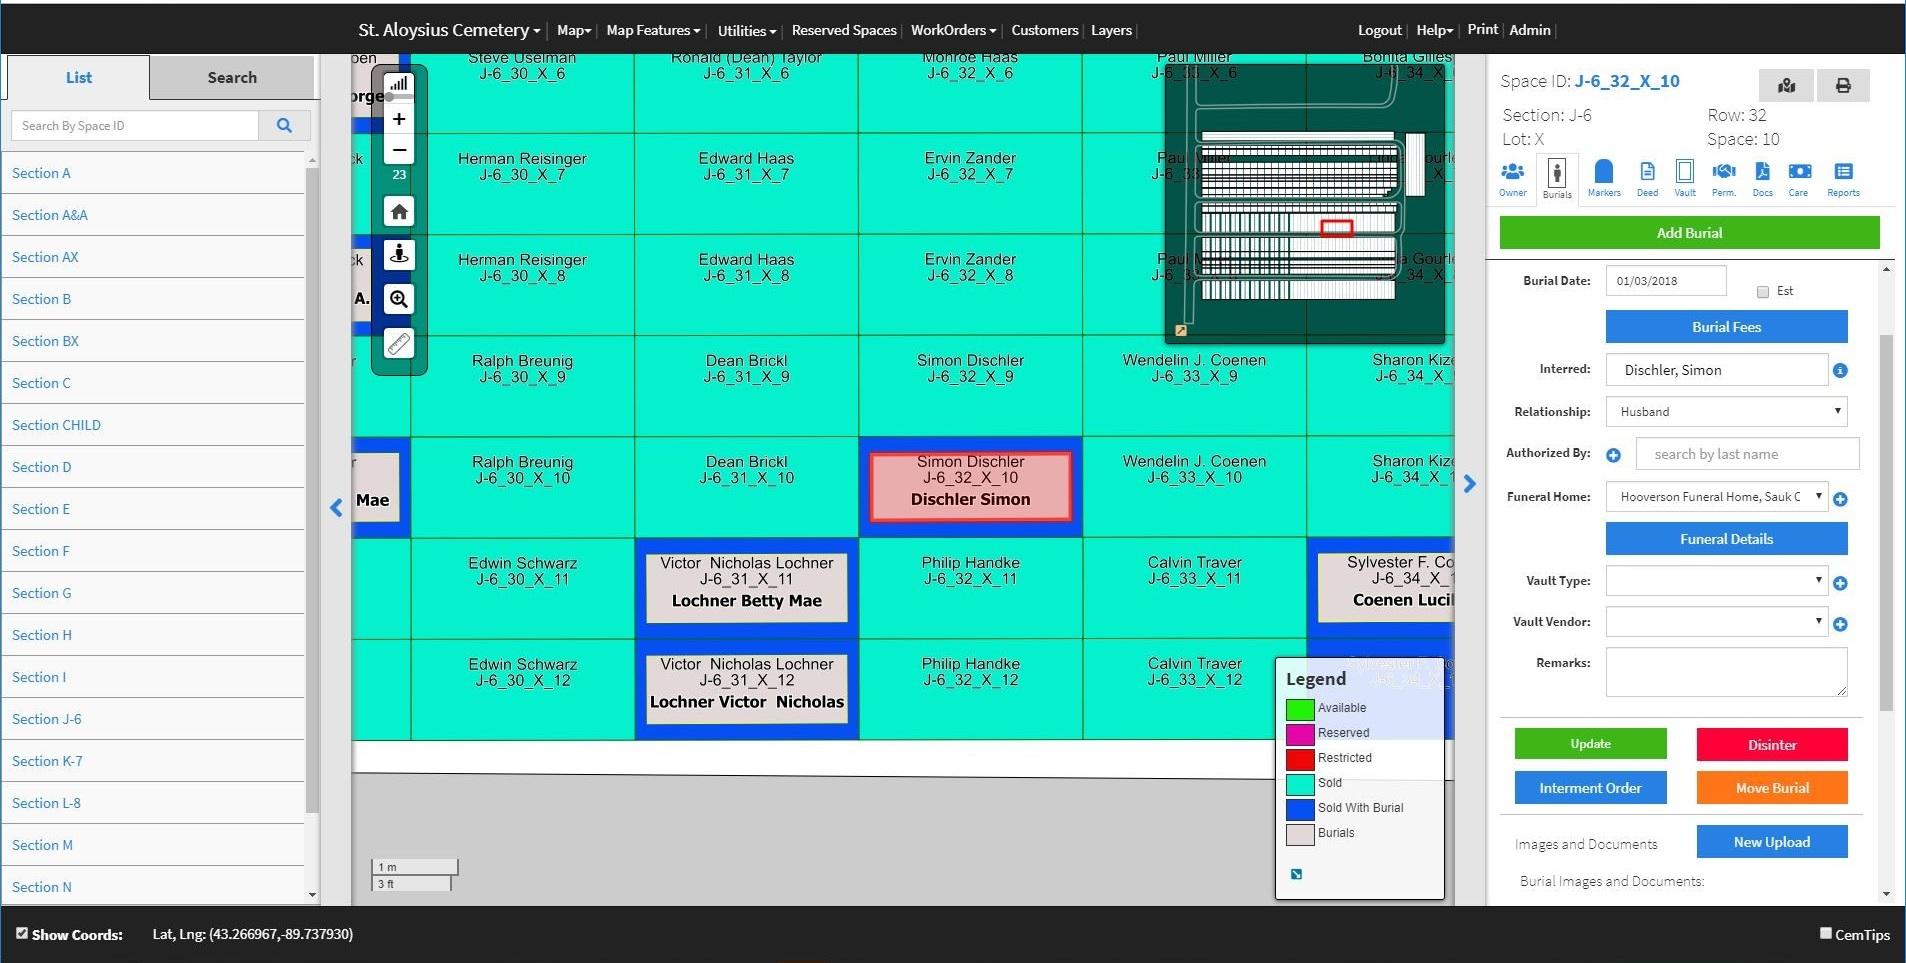 Screenshot of St. Aloysius Cemetery through the CIMS software